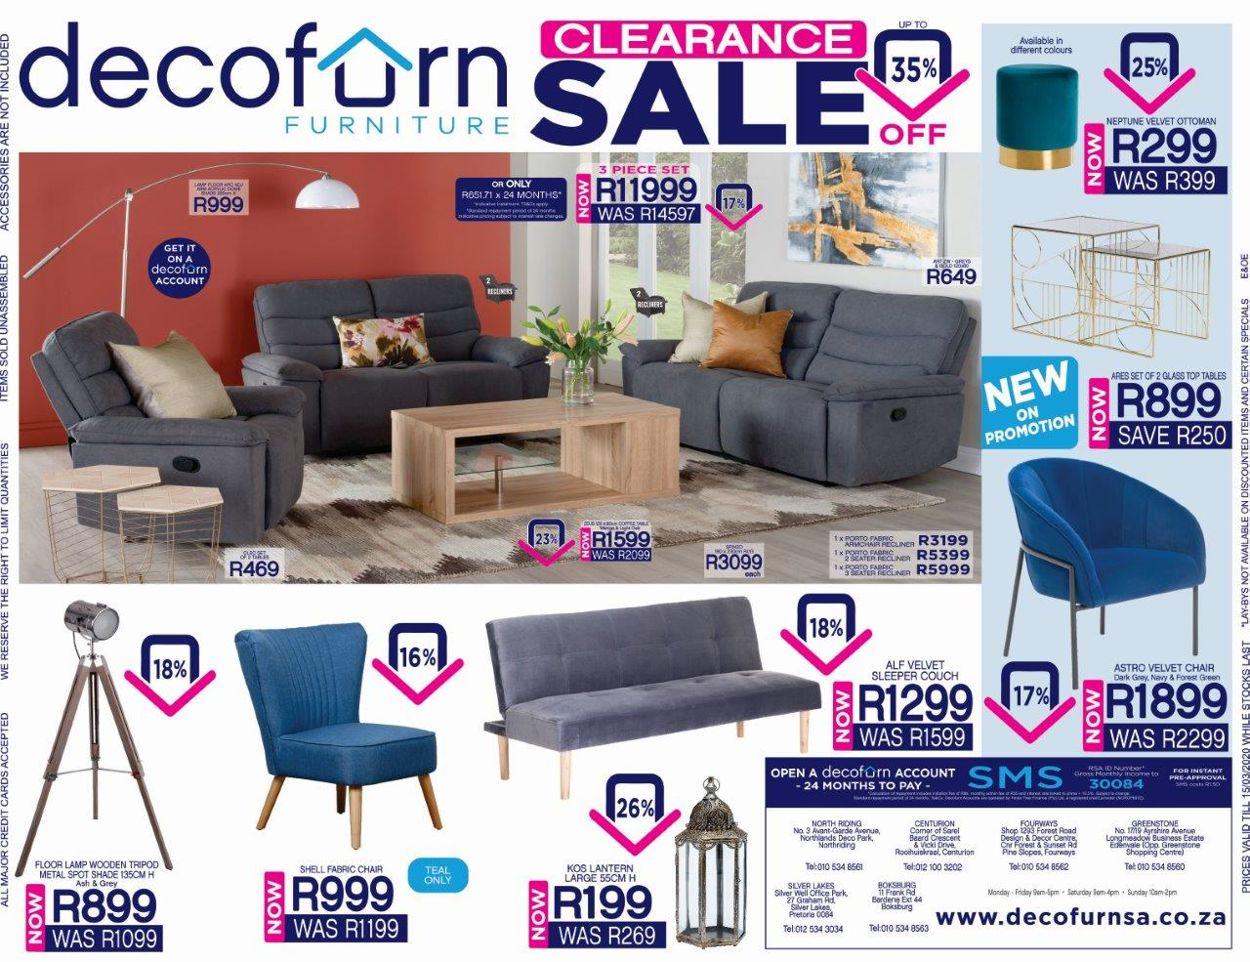 Decofurn Factory Shop Catalogue - 2020/03/09-2020/03/15